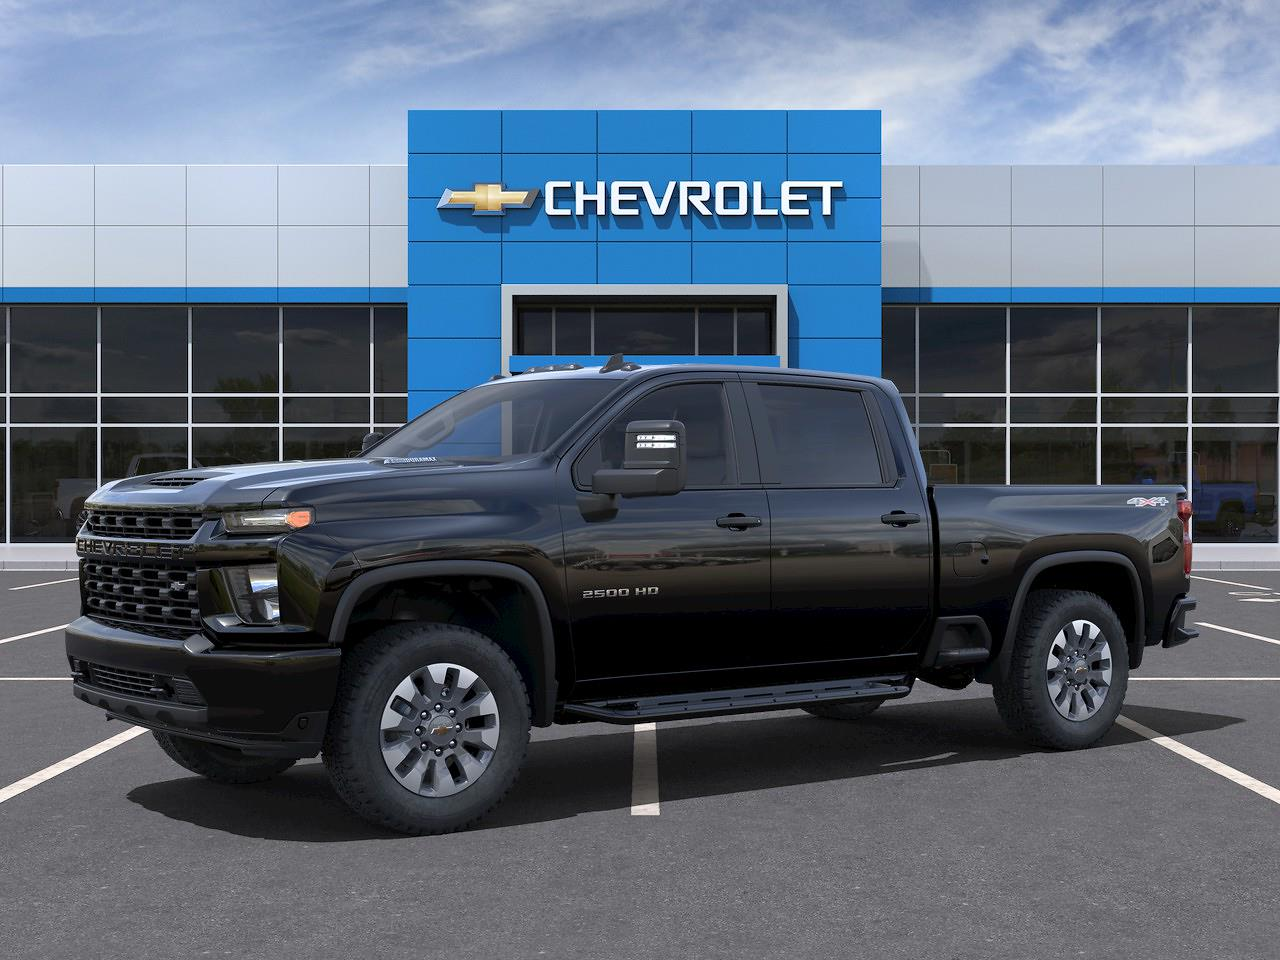 2021 Chevrolet Silverado 2500 Crew Cab 4x4, Pickup #Q210455 - photo 3